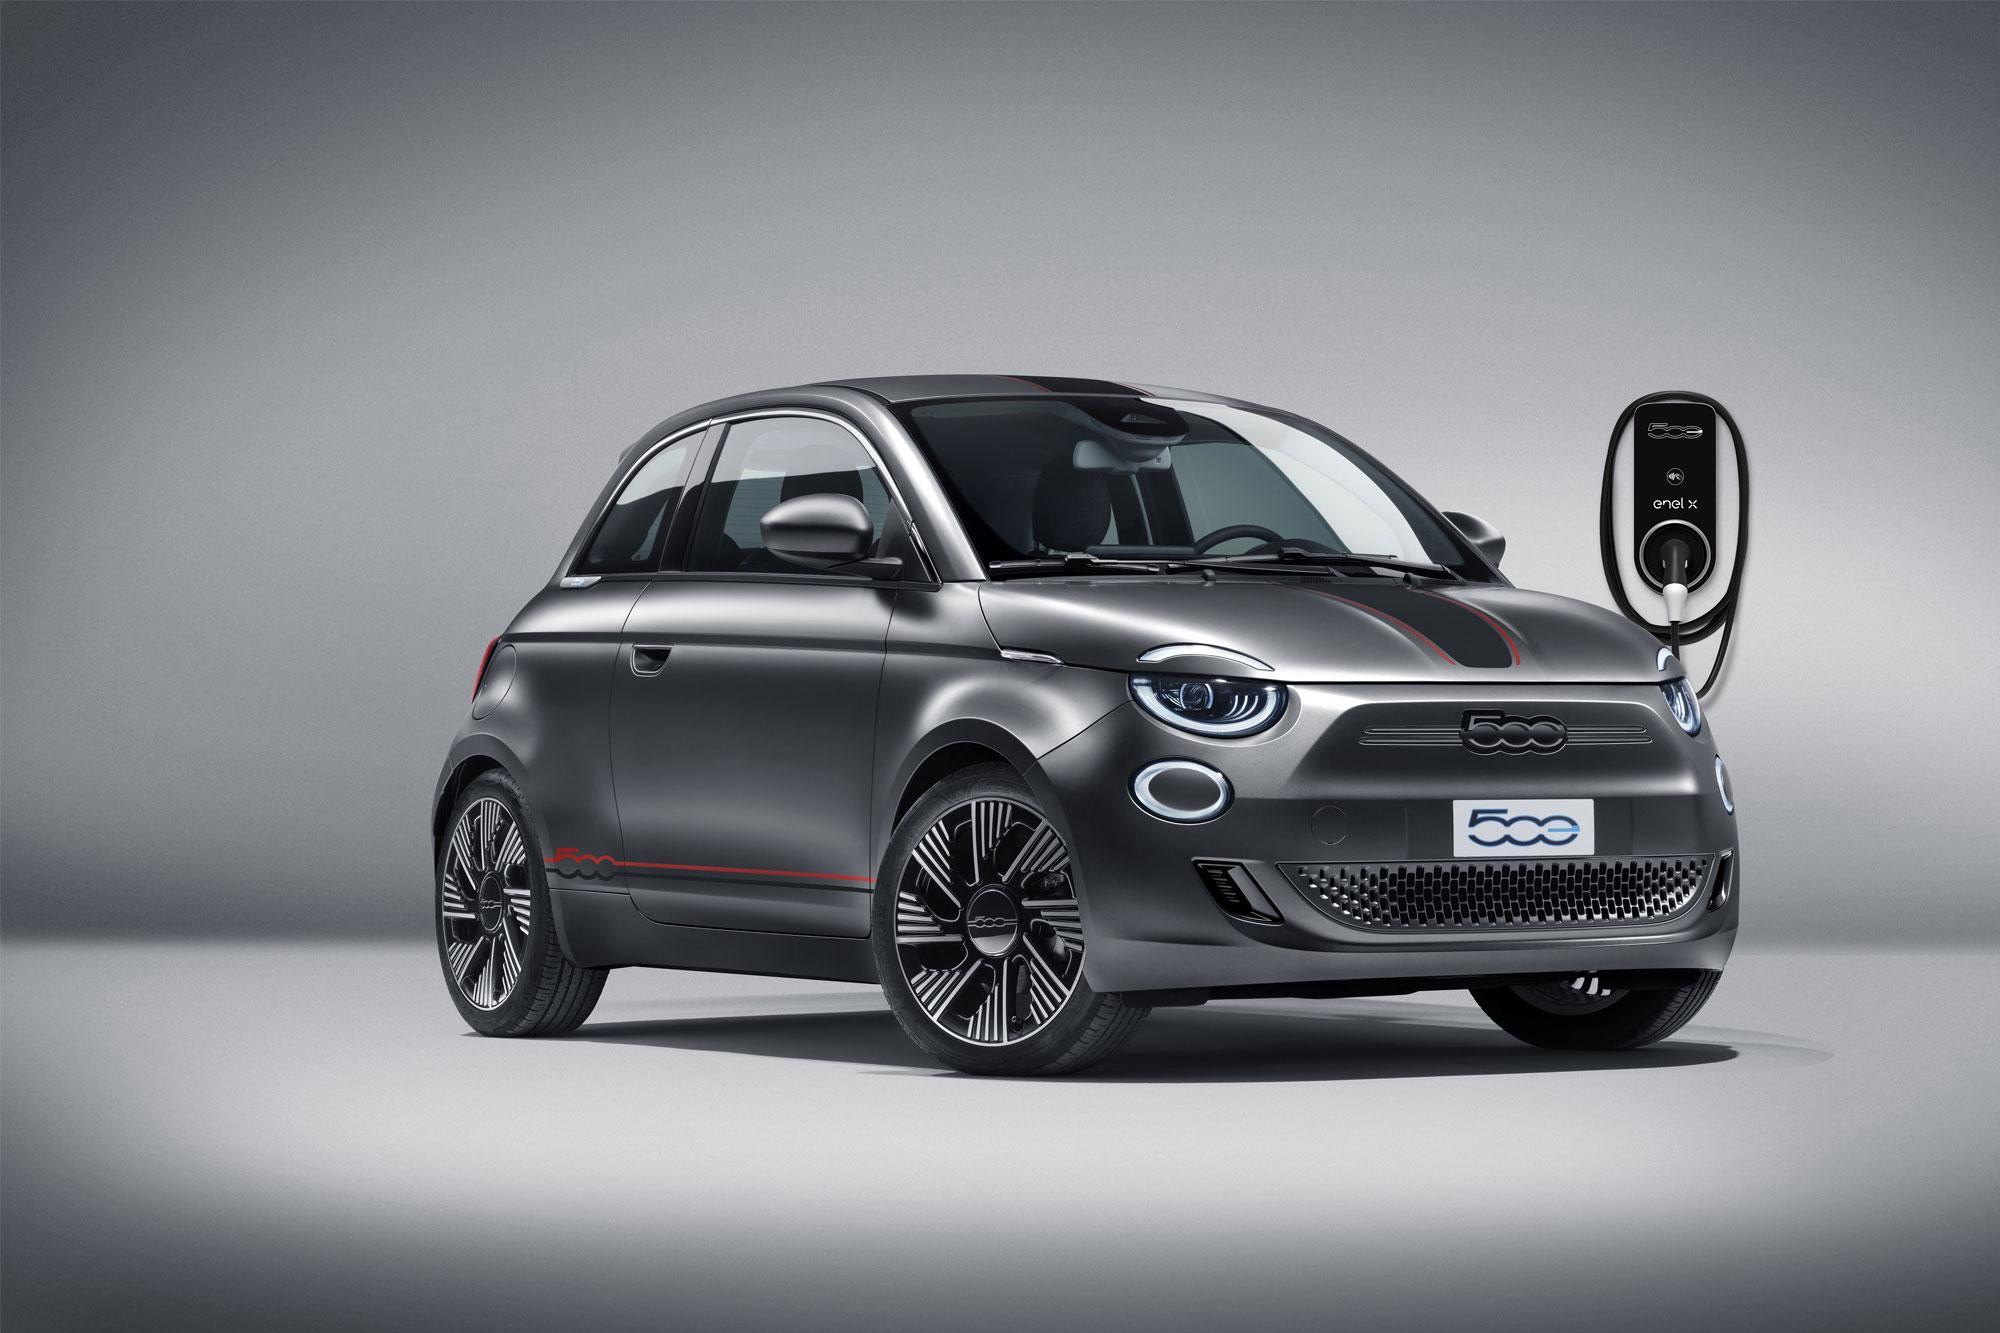 H Mopar κάνει πιο ξεχωριστό το ηλεκτρικό Fiat 500